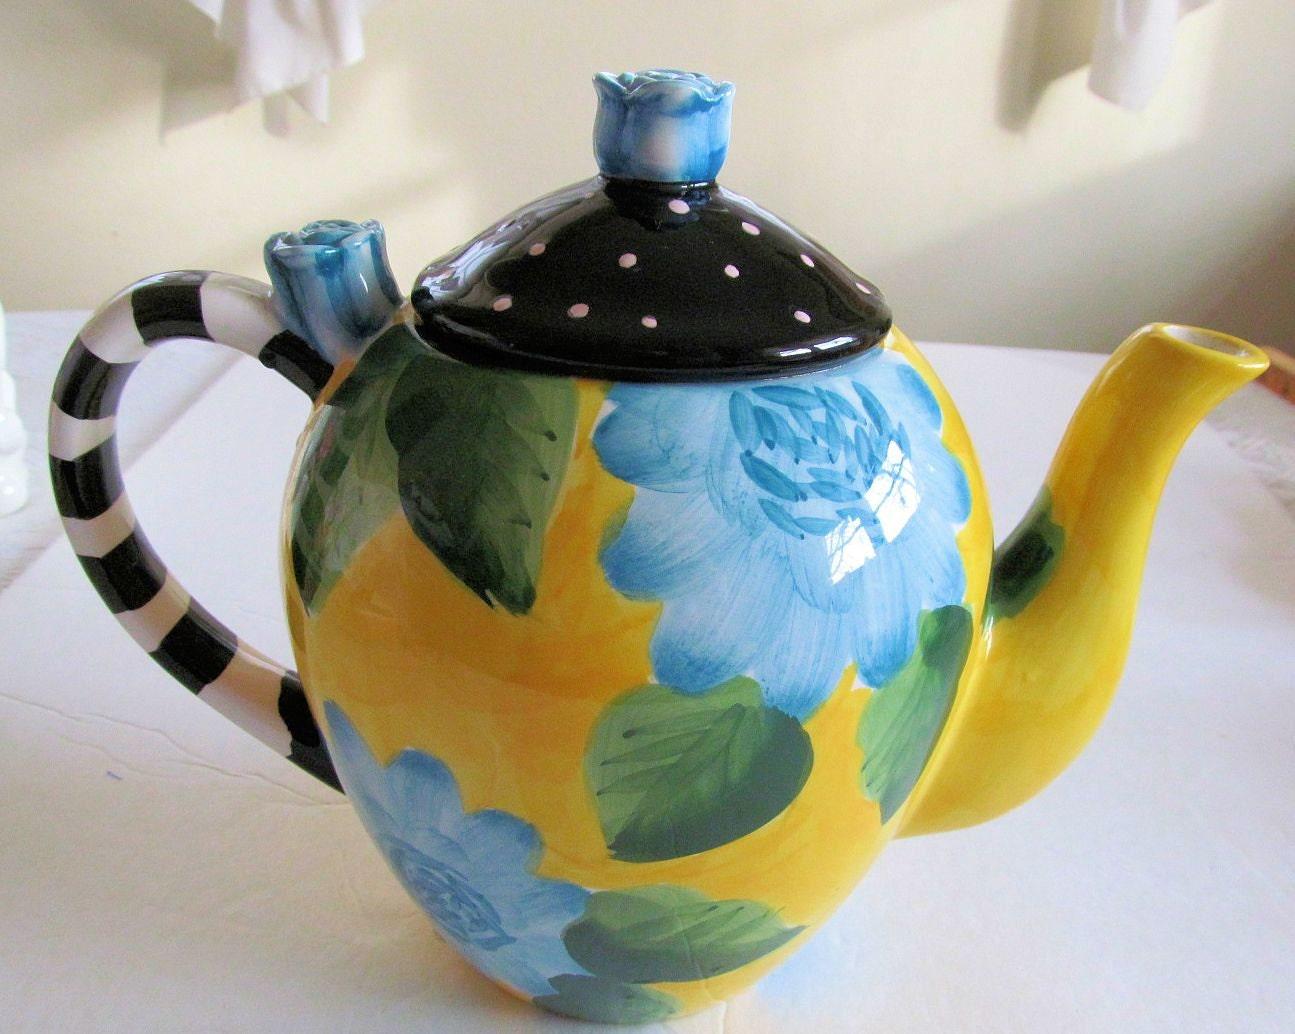 Charming Modern Ceramic TEAPOT Blue ROSES & DAHLIAS Yellow